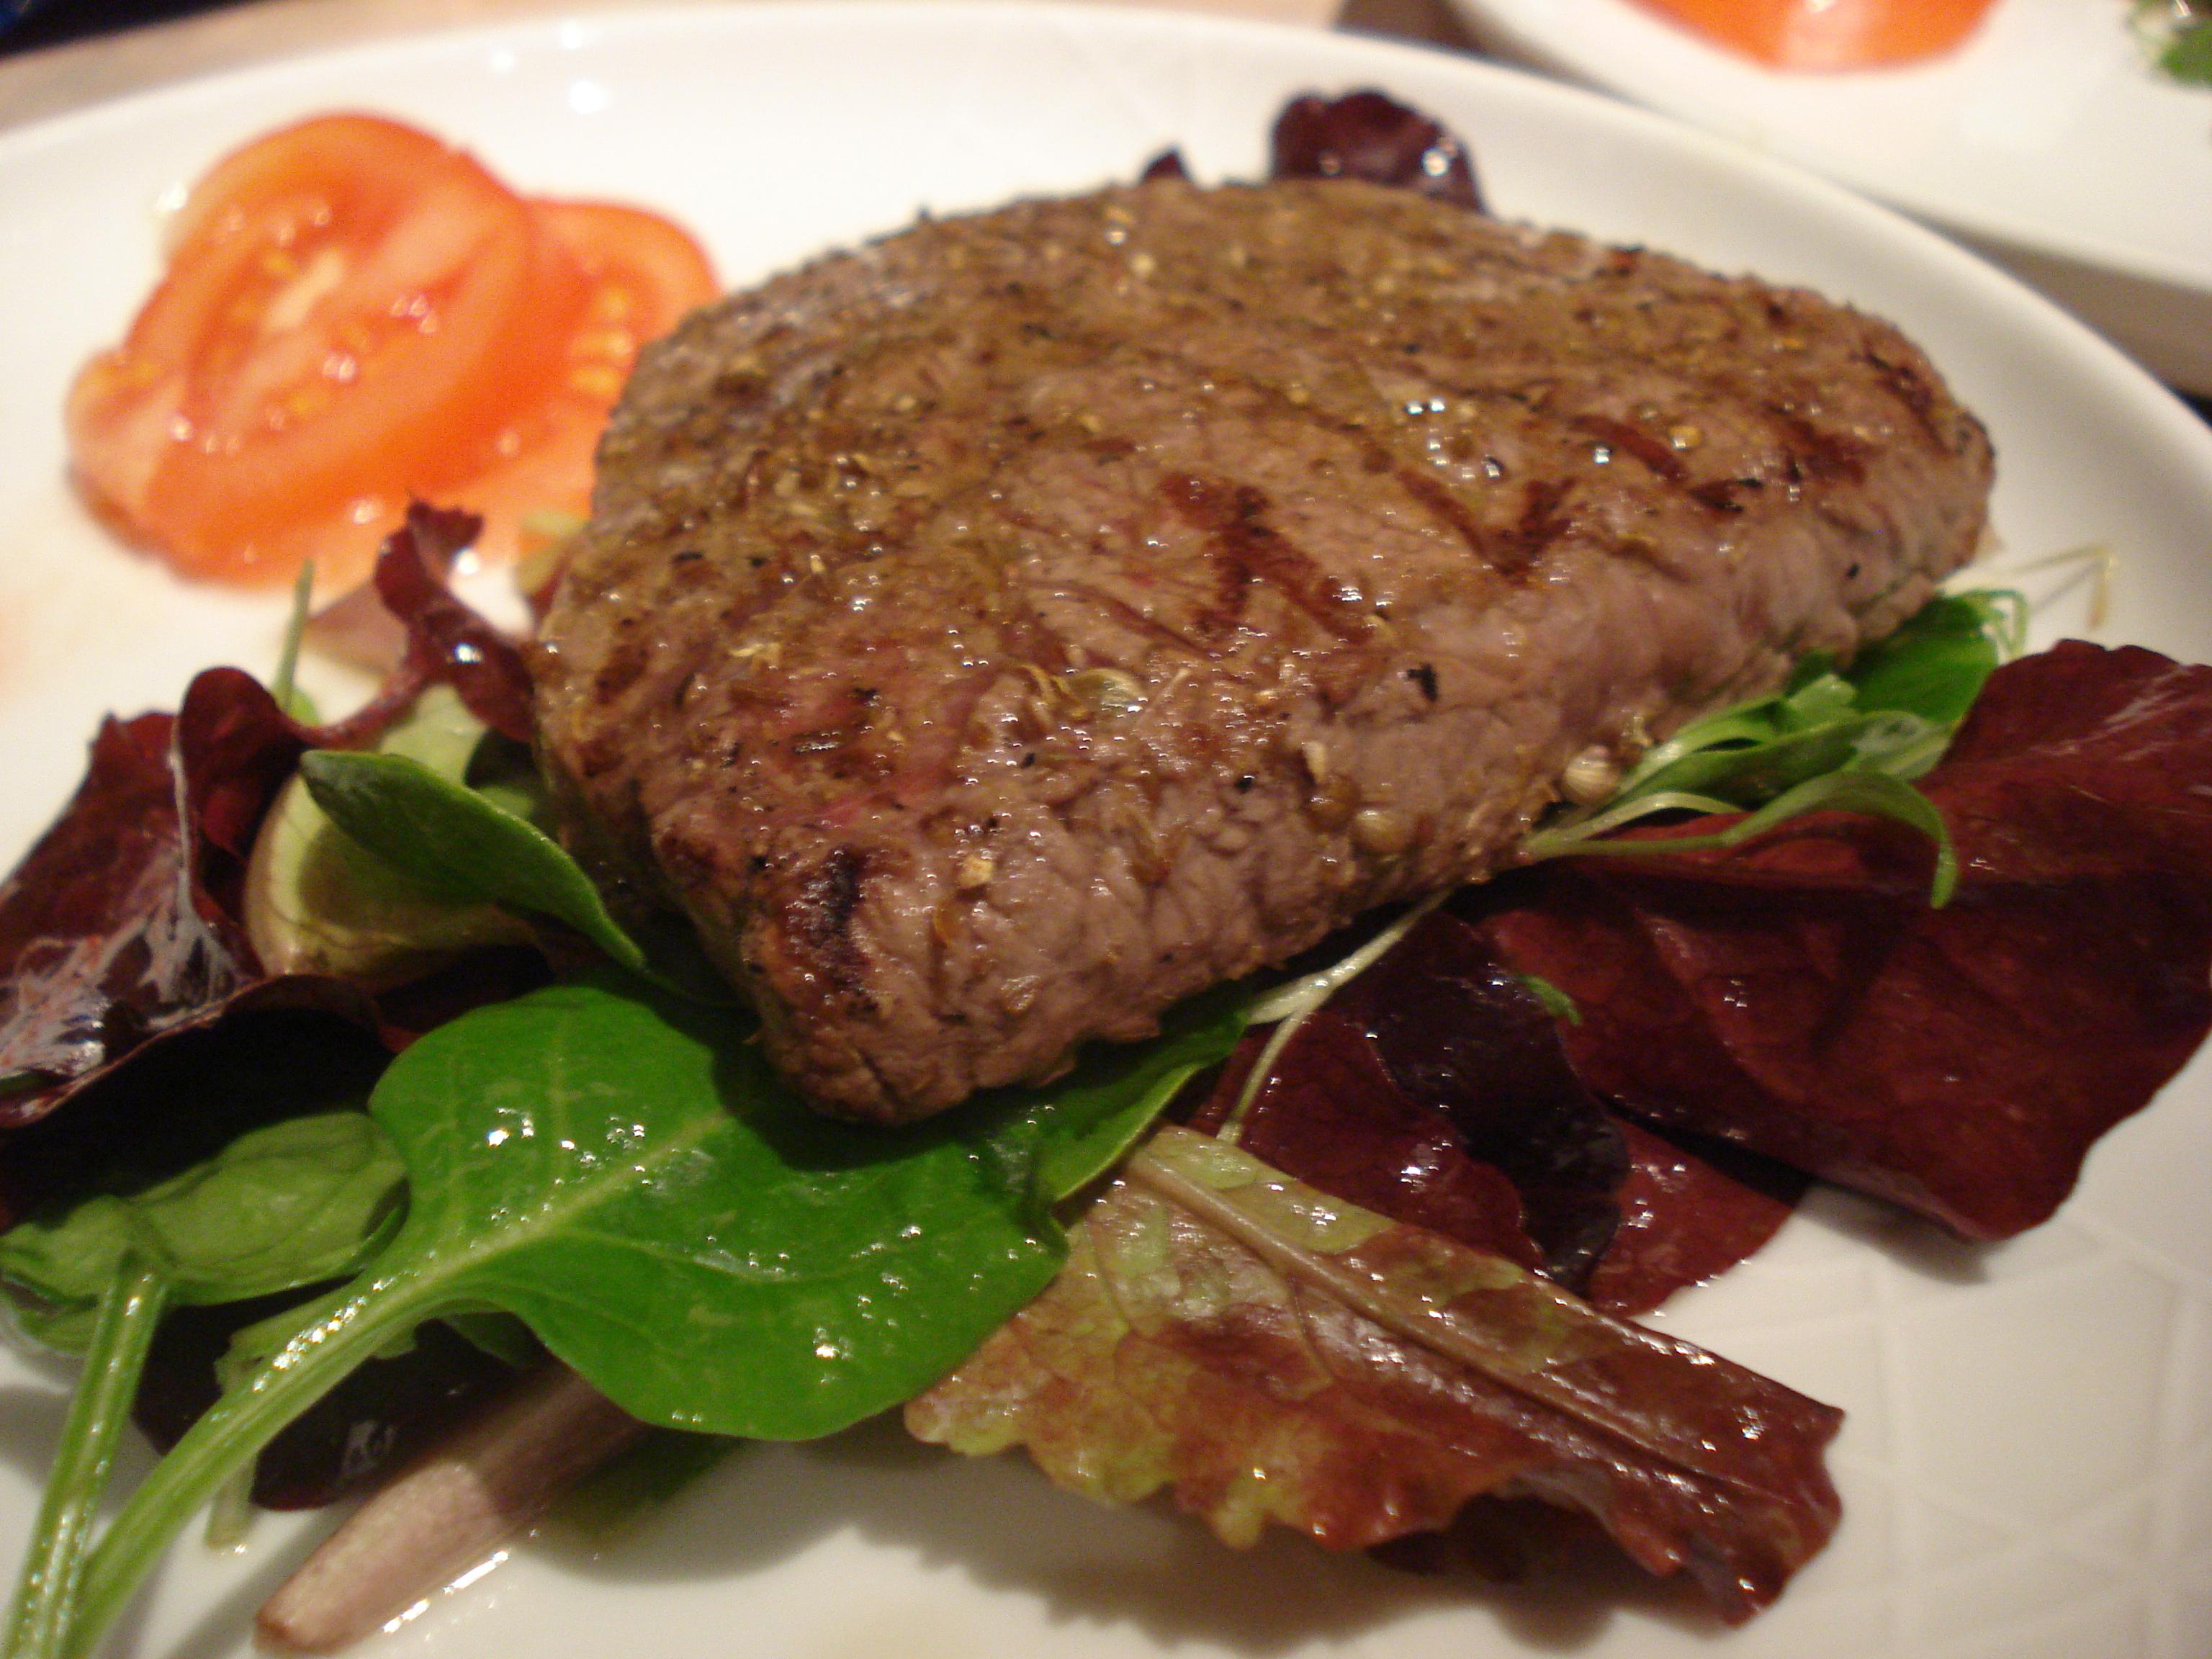 cumin and coriander steak salad